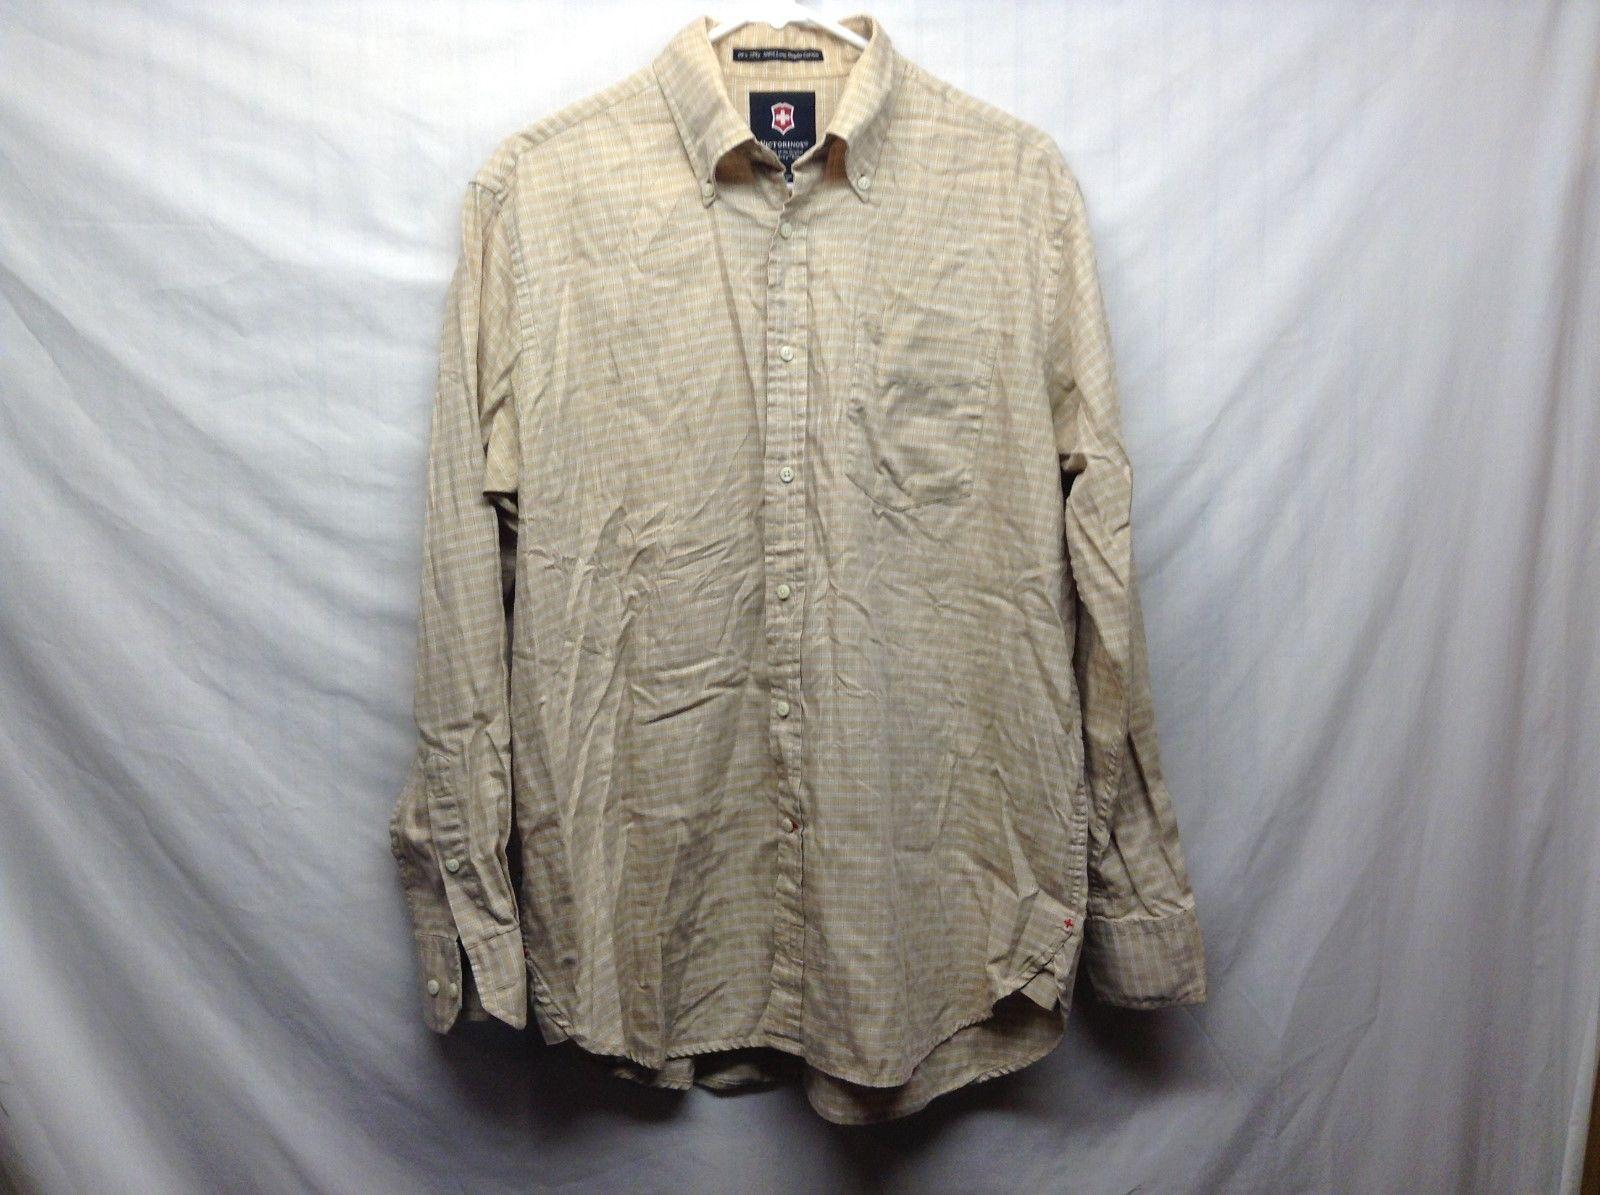 Men's Beige Long Sleeve Button Up Shirt by Victorinox Sz M